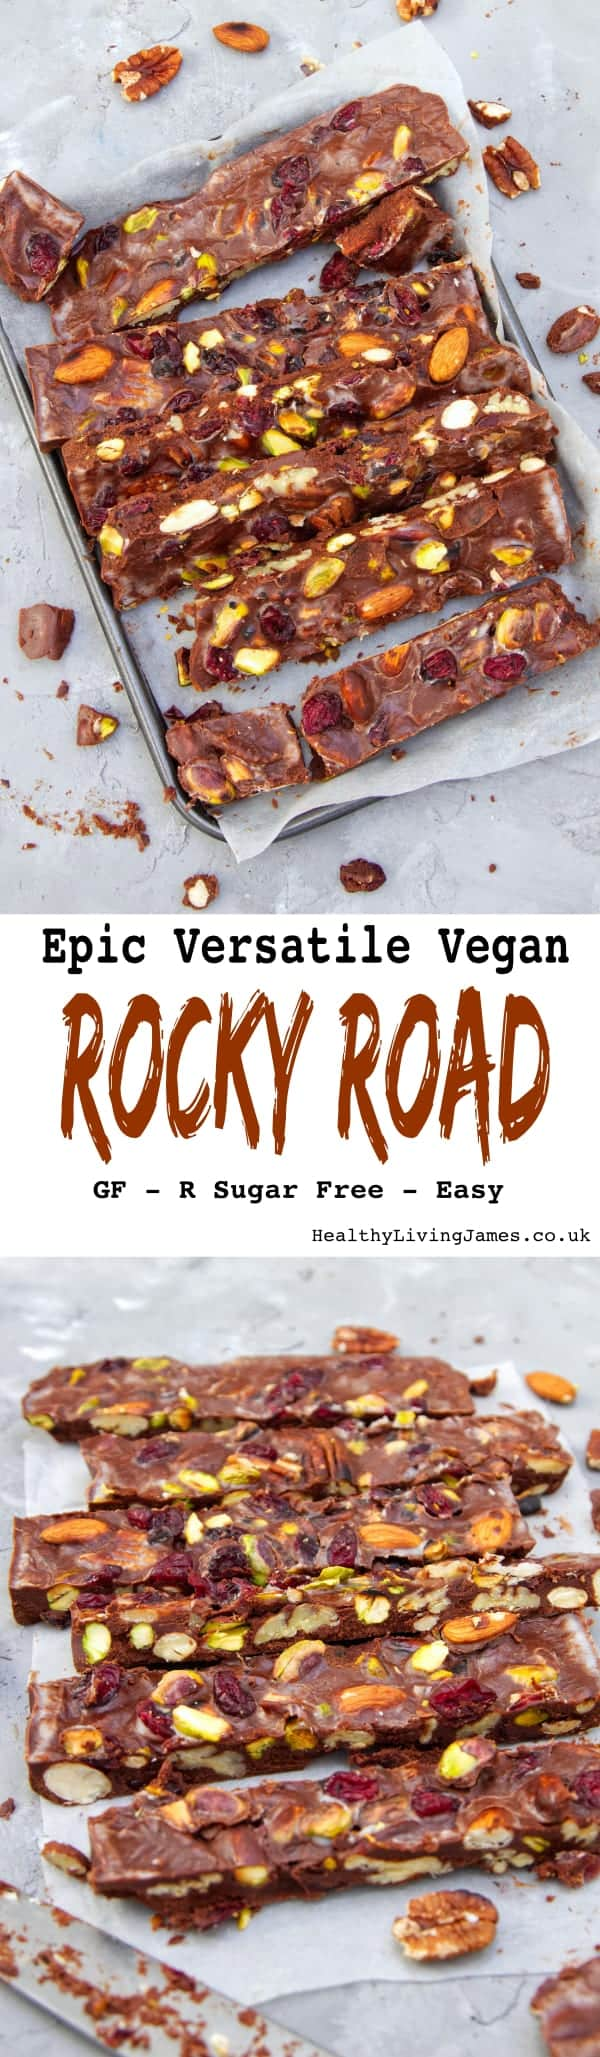 Epic Vegan Rocky Road Pin